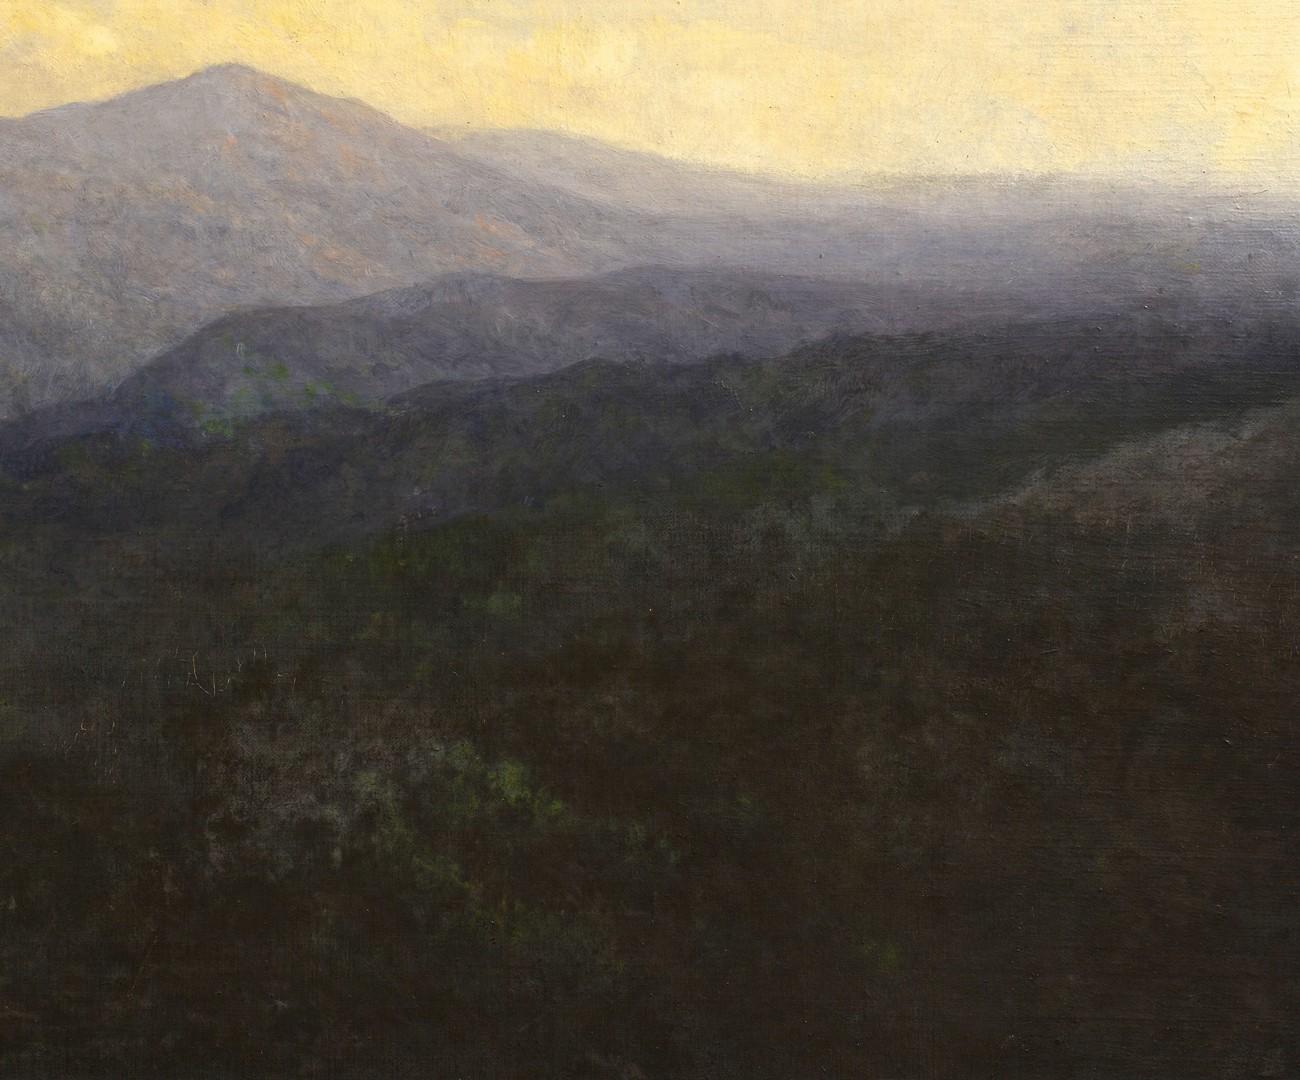 Lot 212: Lg. Charles Krutch O/C of Mt. LeConte